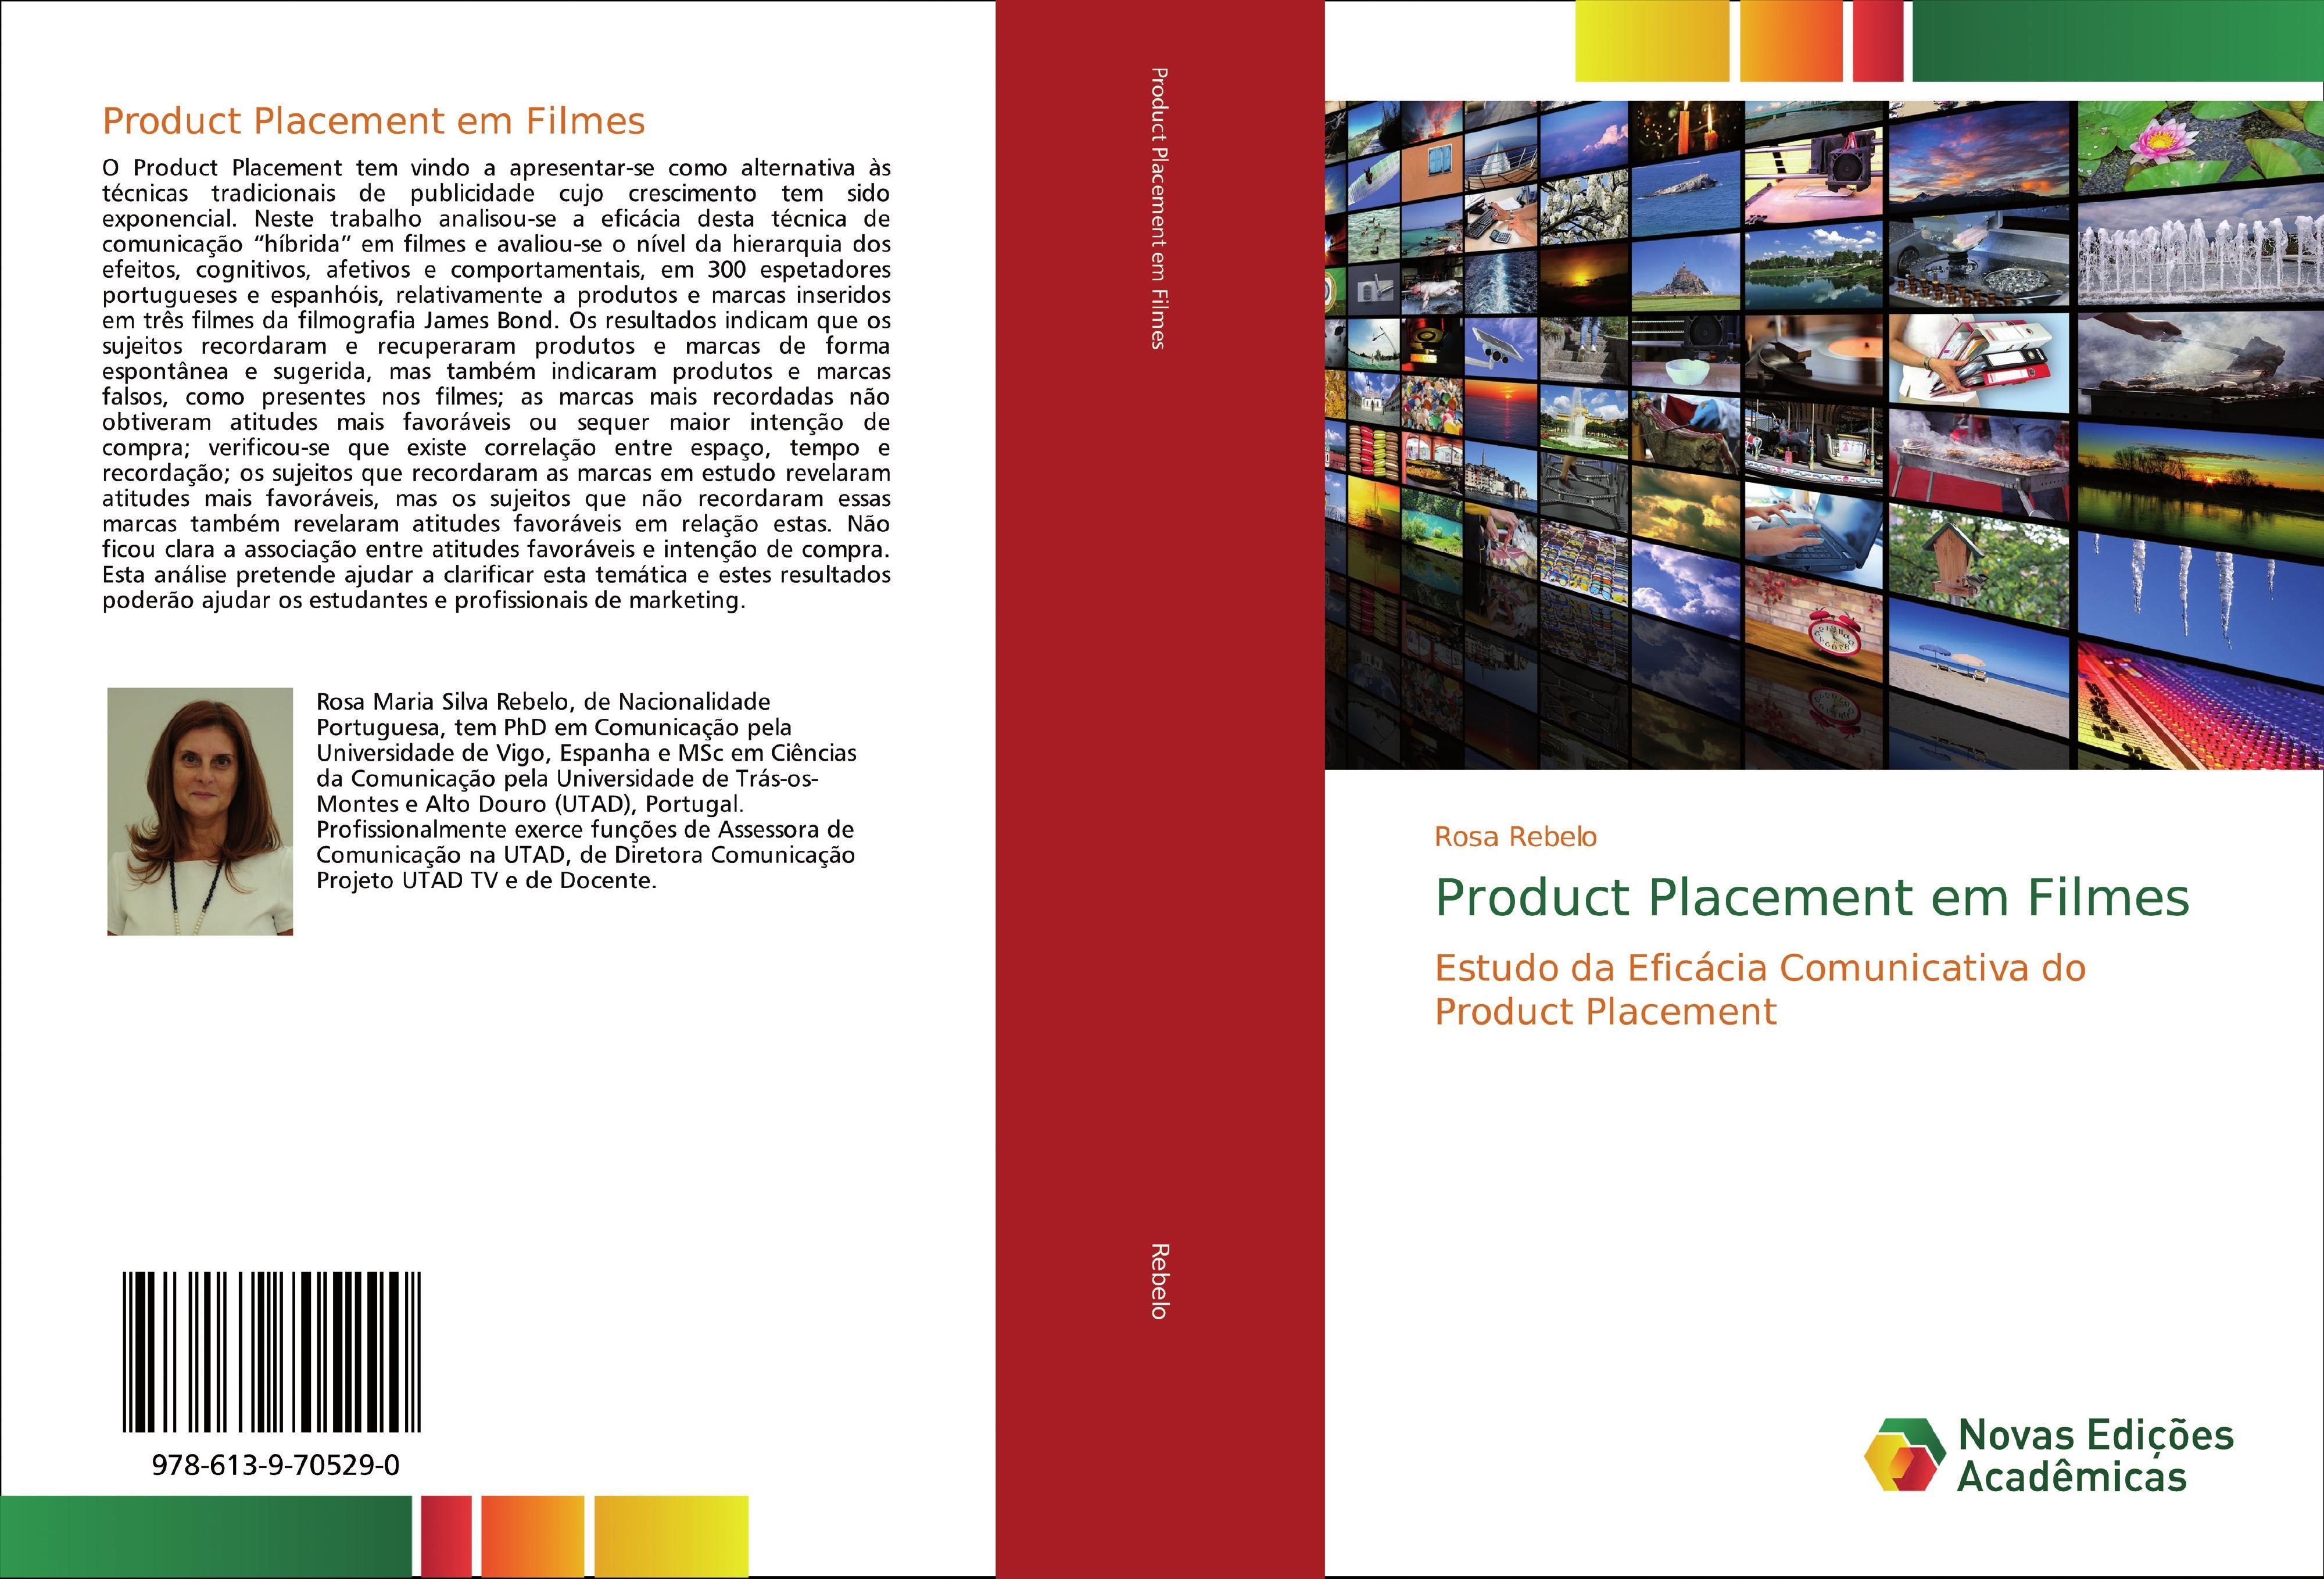 Product Placement em Filmes  Estudo da Eficácia Comunicativa do Product Placement  Rosa Rebelo  Taschenbuch  Paperback  Portugiesisch  2019 - Rebelo, Rosa